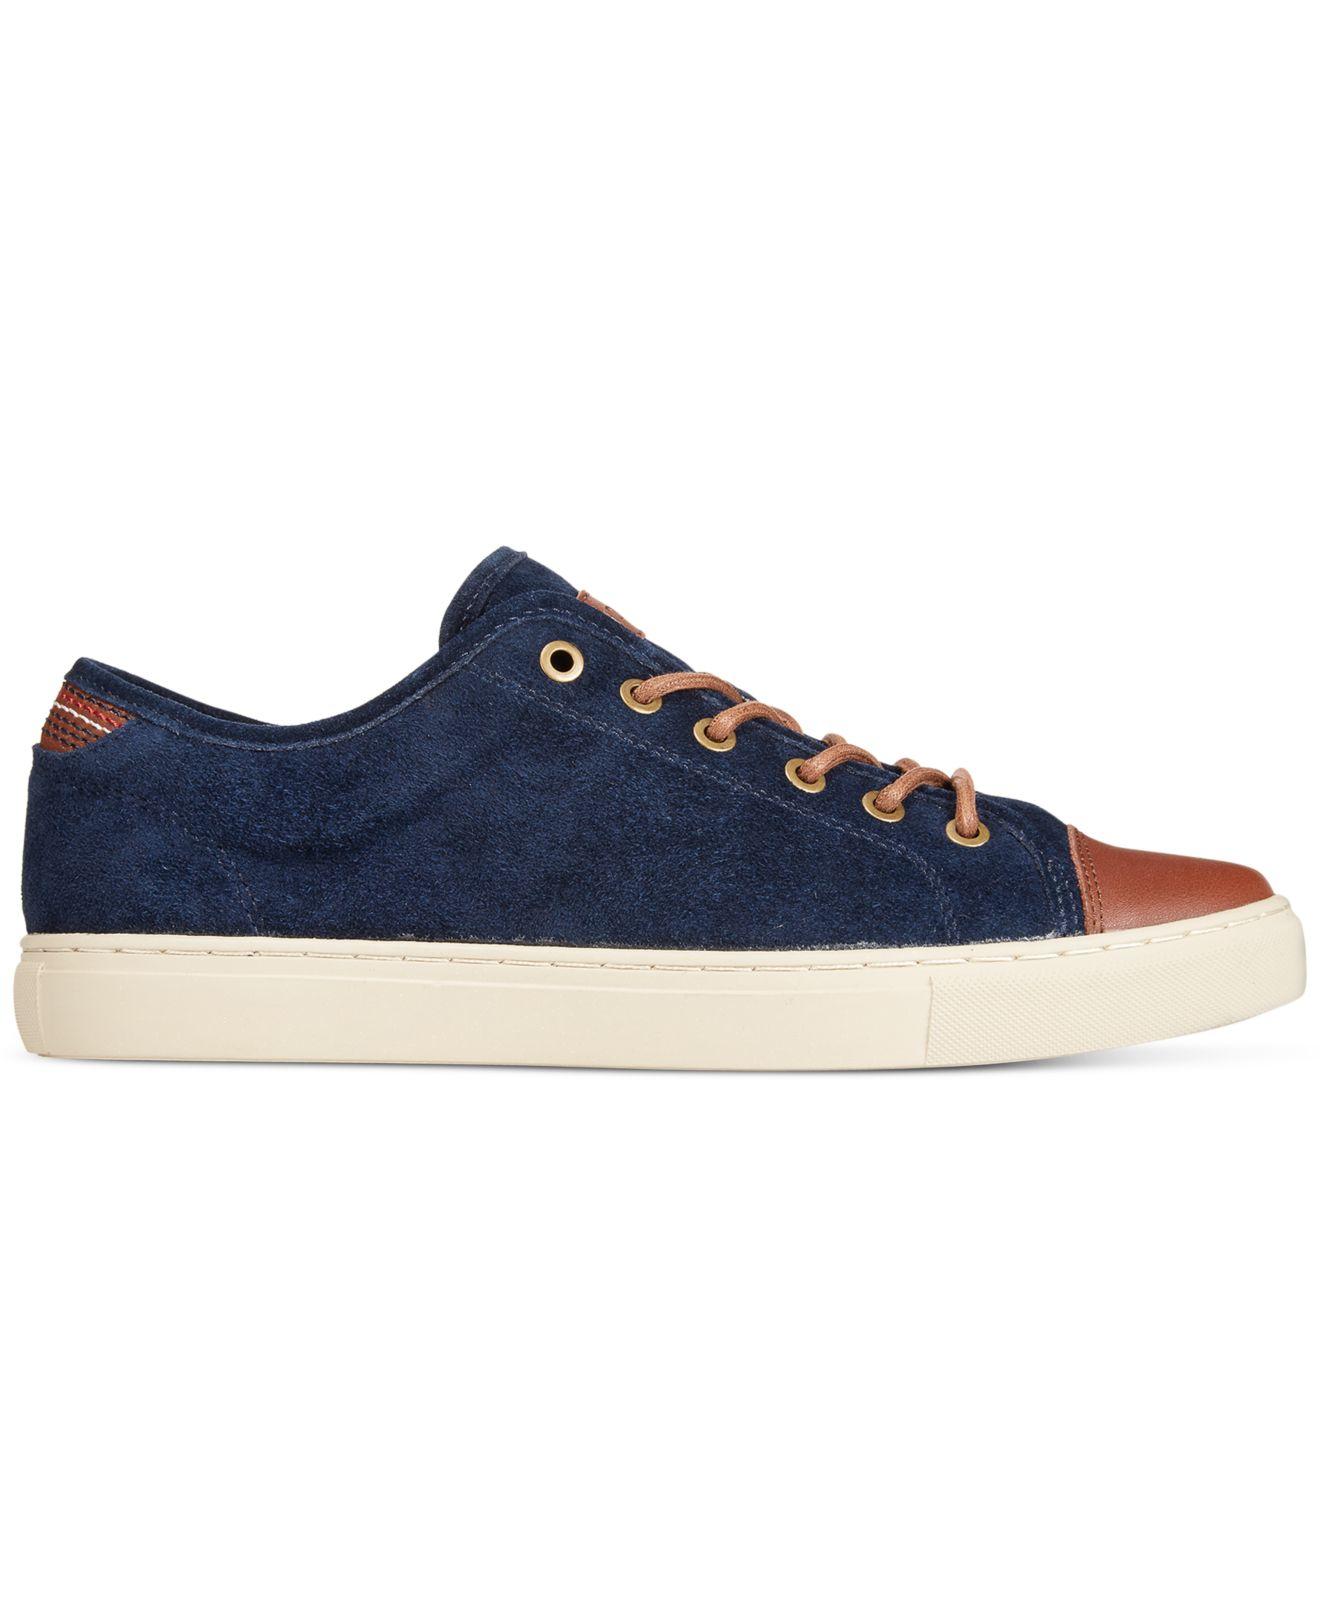 tommy hilfiger mason sneakers in blue for men lyst. Black Bedroom Furniture Sets. Home Design Ideas